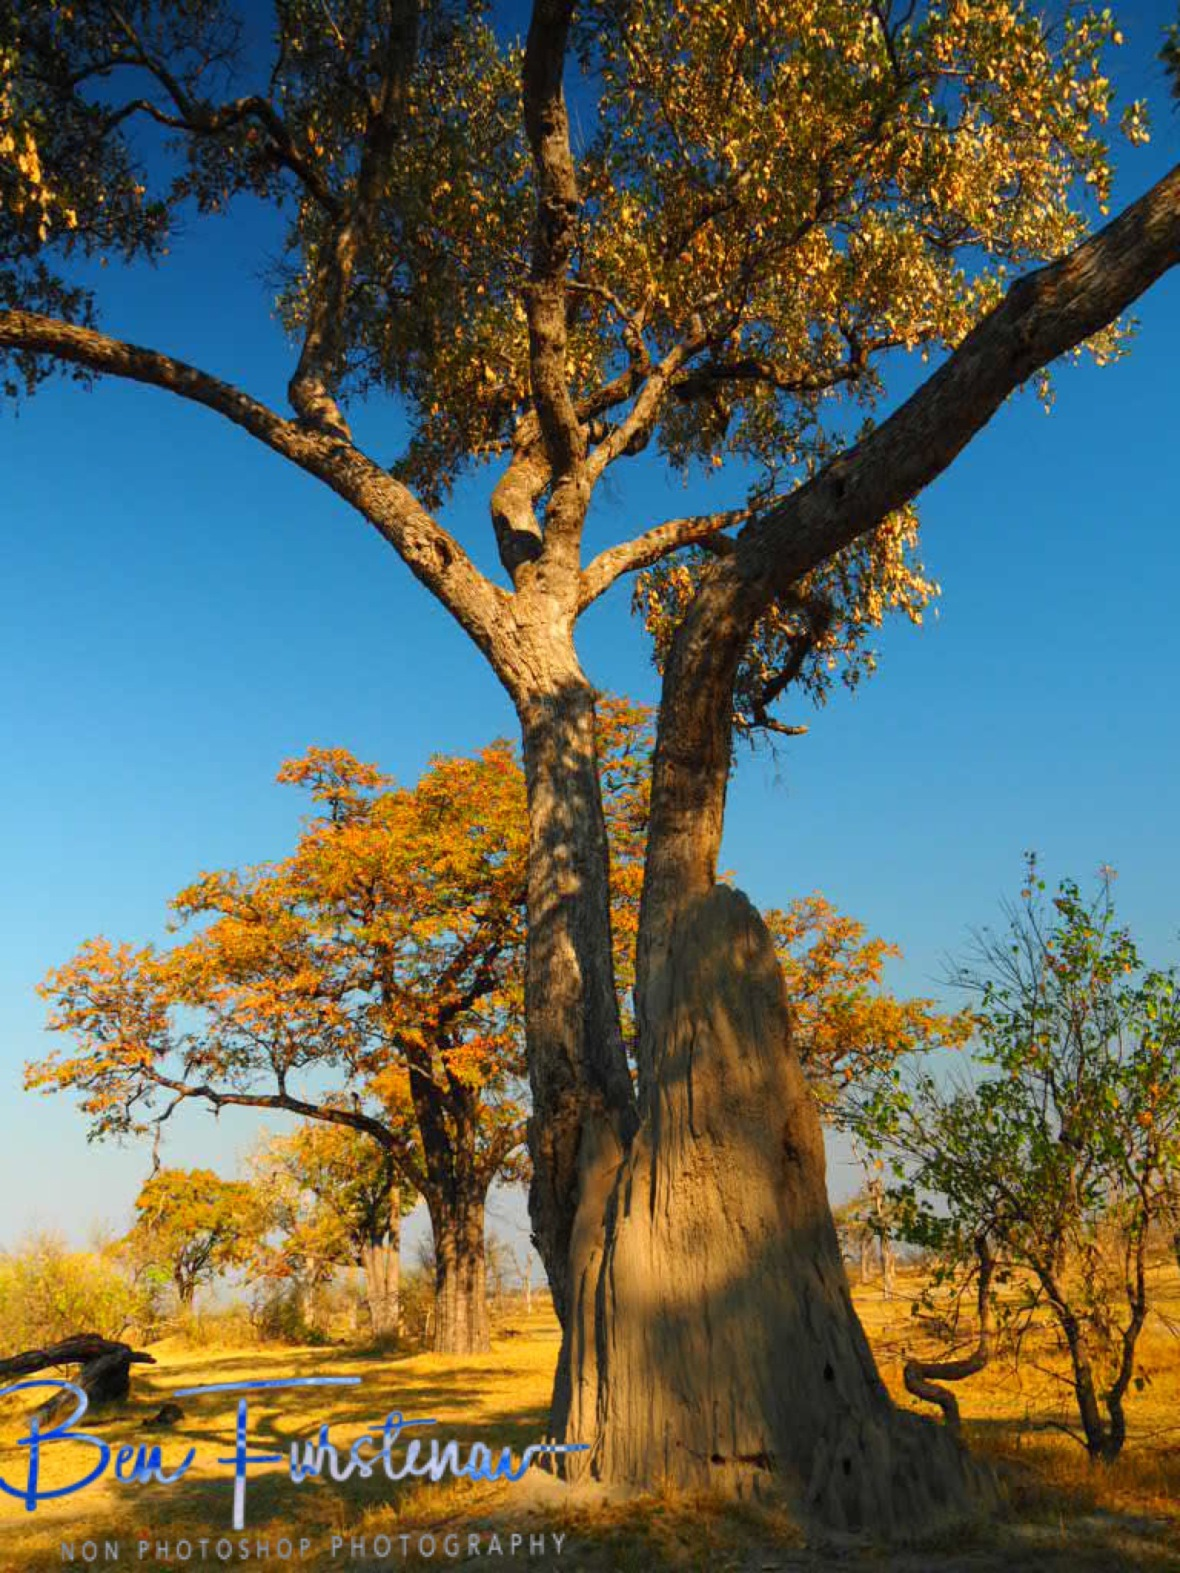 Paradise wonderland, Moremi National Park, Okavango Delta, Botswana